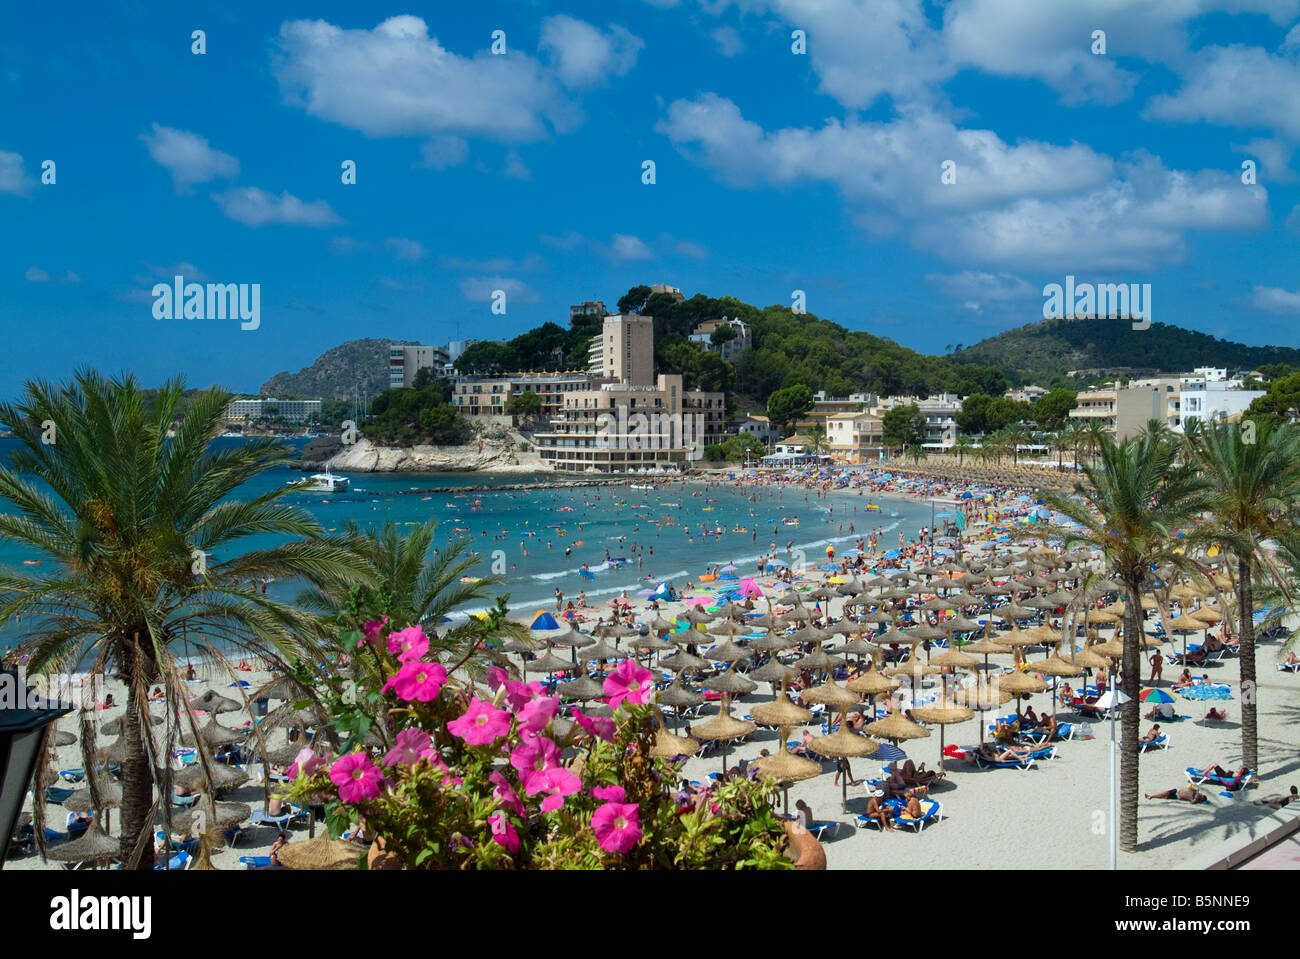 Paguera Beach Mallorca Balearics Spain Stock Photo Alamy